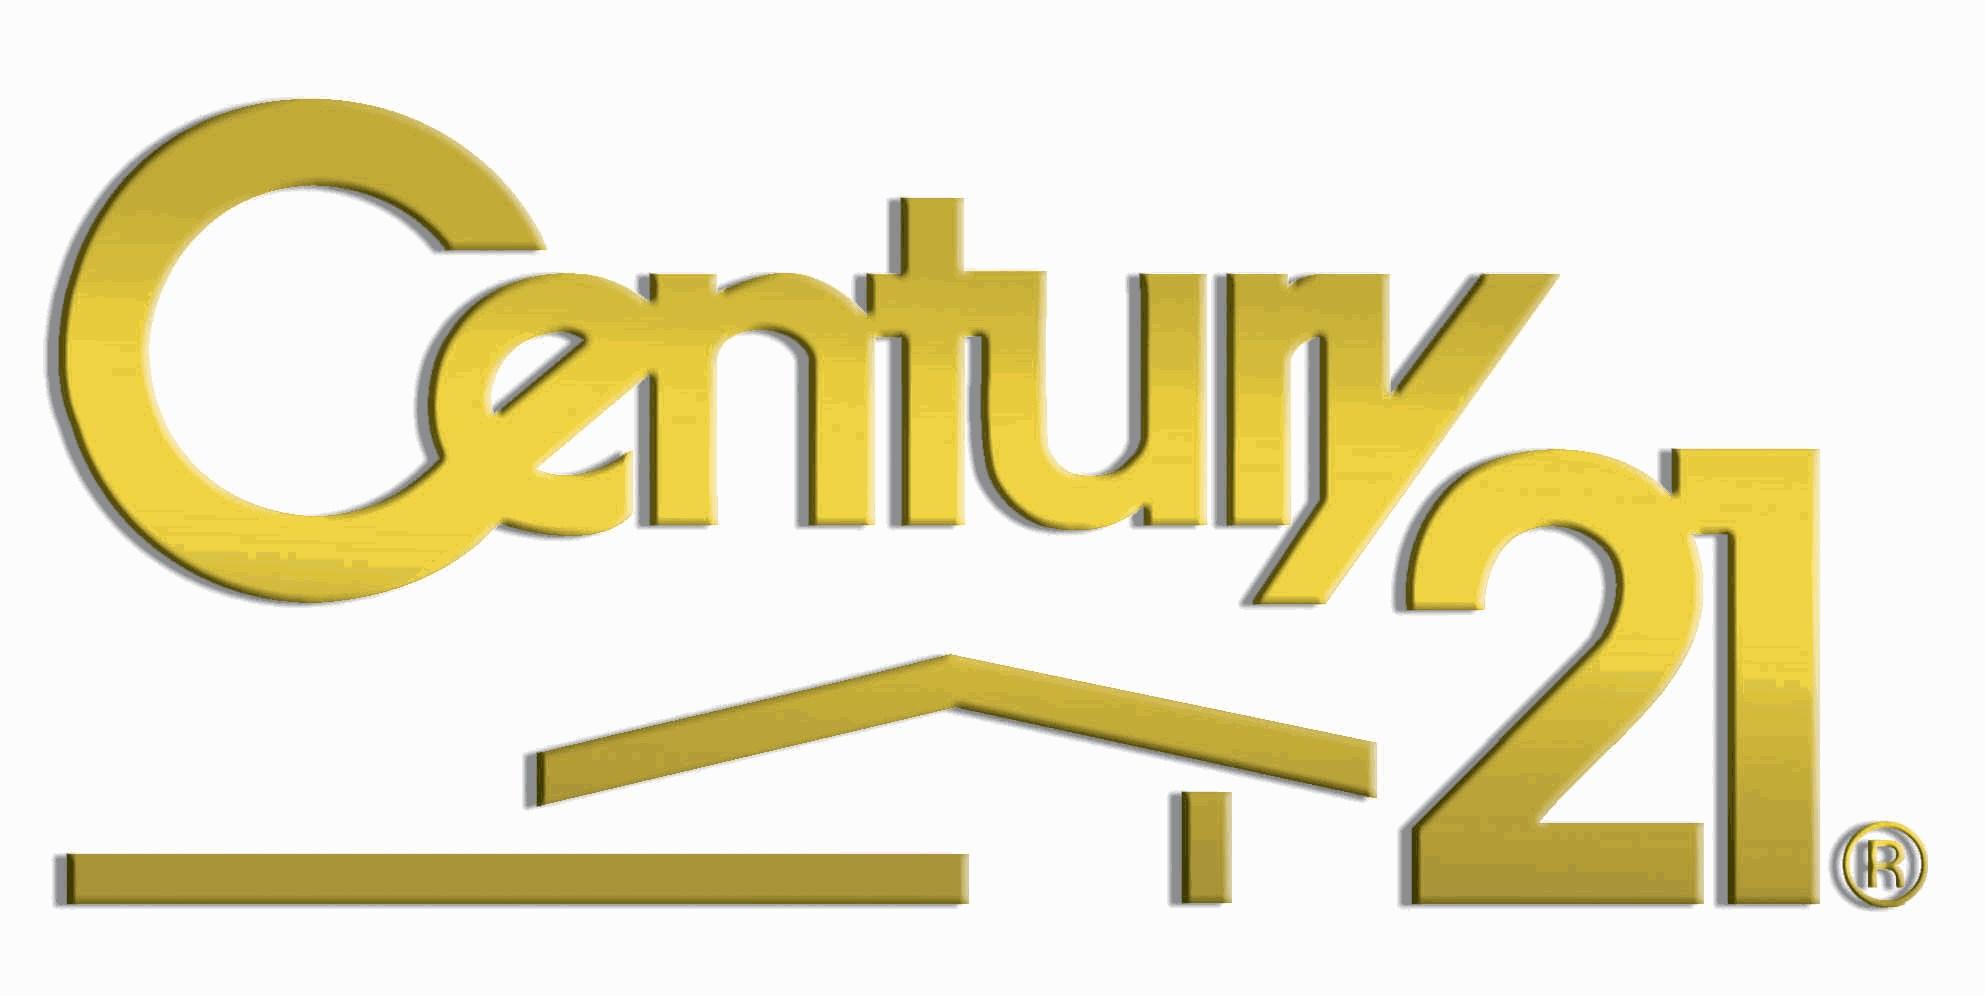 Century 21 parmentier saint maur agence immobili re paris for Agence immobiliere 75011